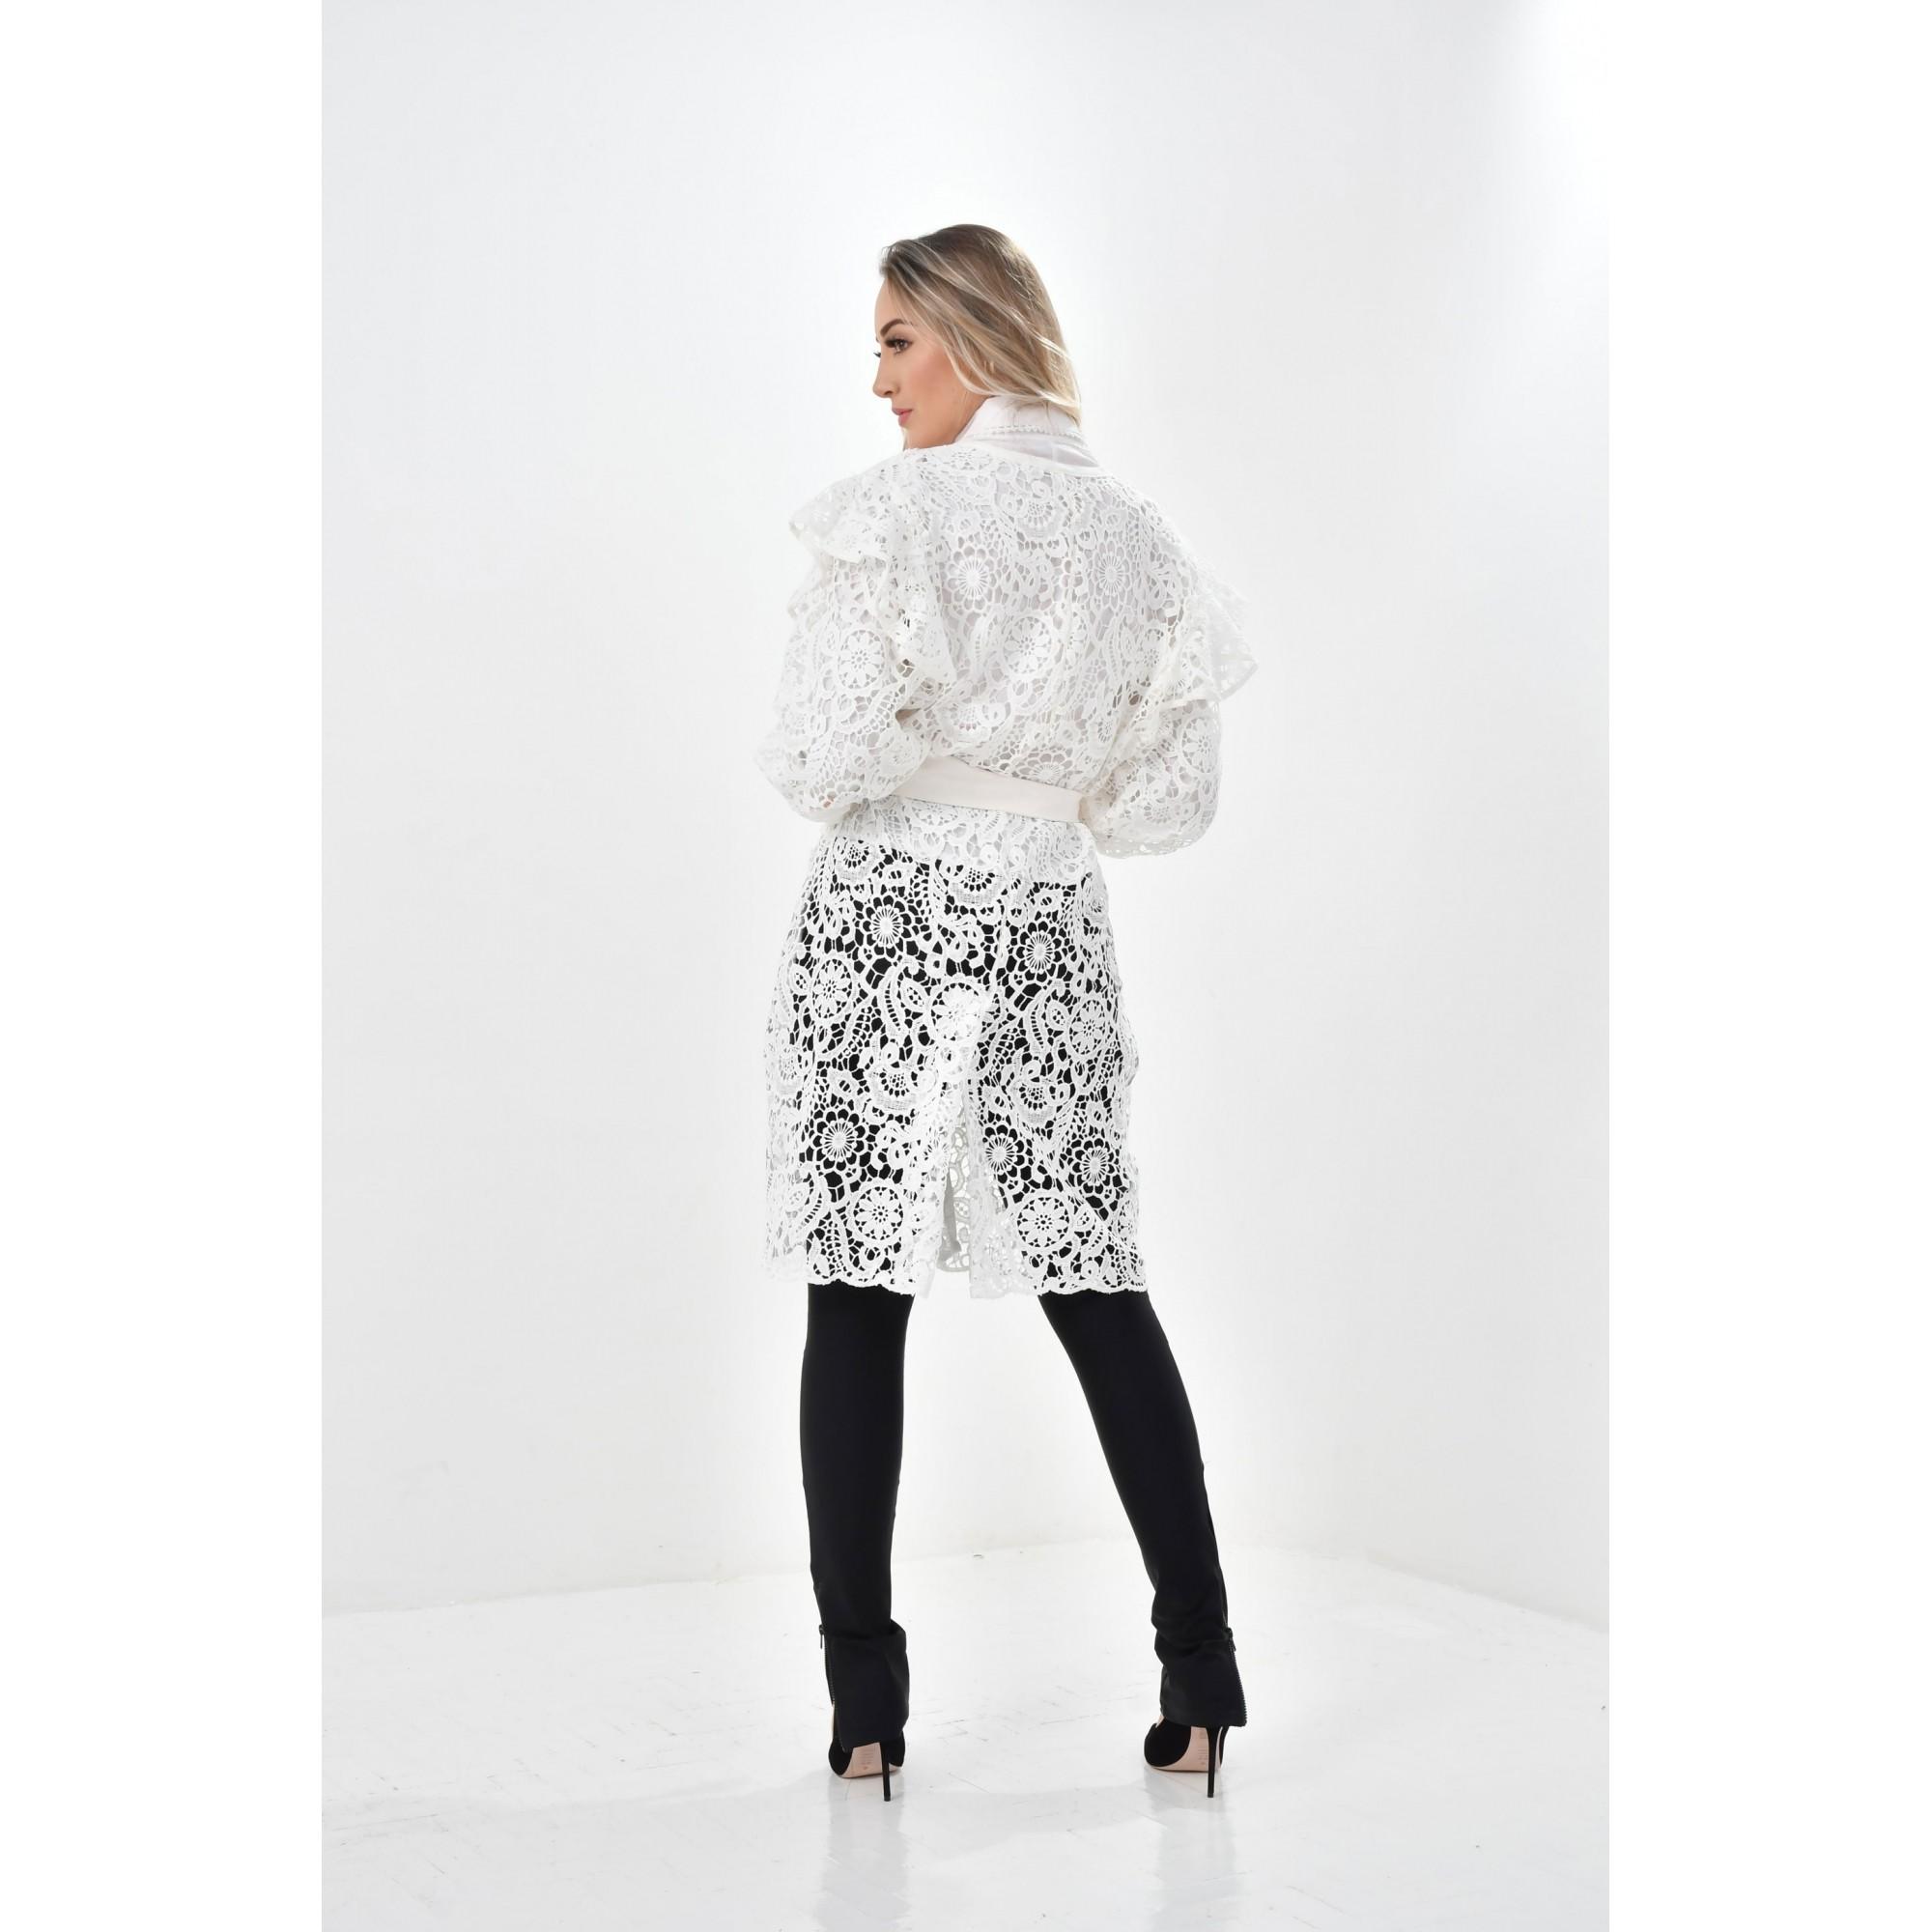 Jaleco Fernanda  - Luxo Branco - Jalecos Personalizado Feminino